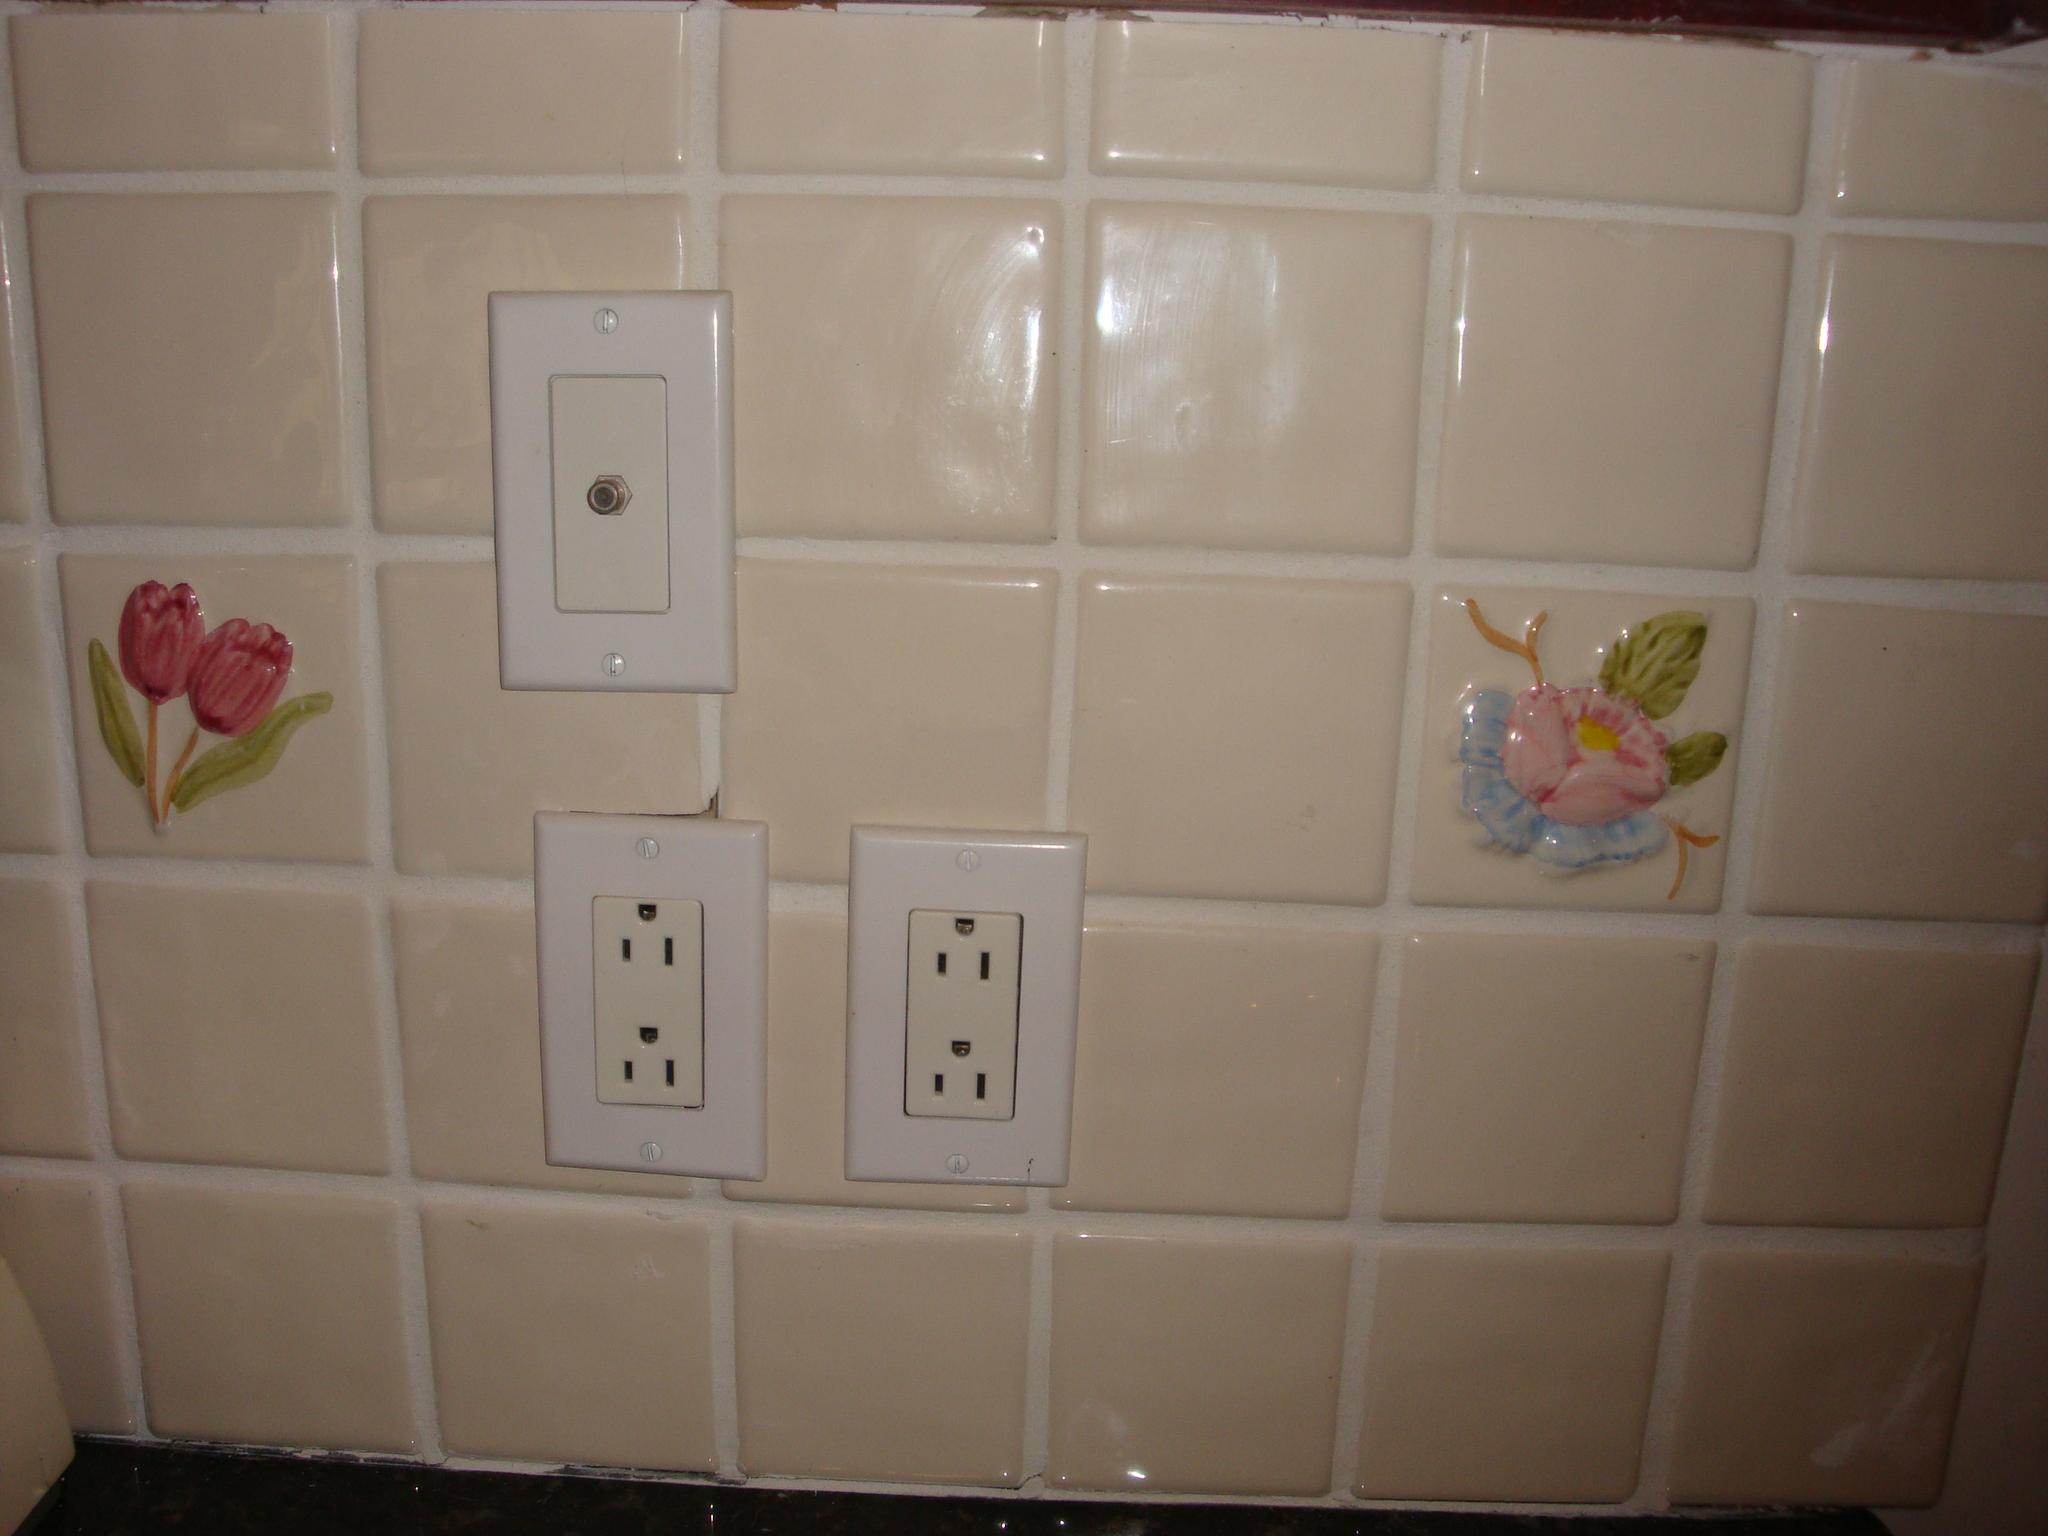 replacing kitchen backsplash tile kitchen backsplash Replacing kitchen backsplash dsc